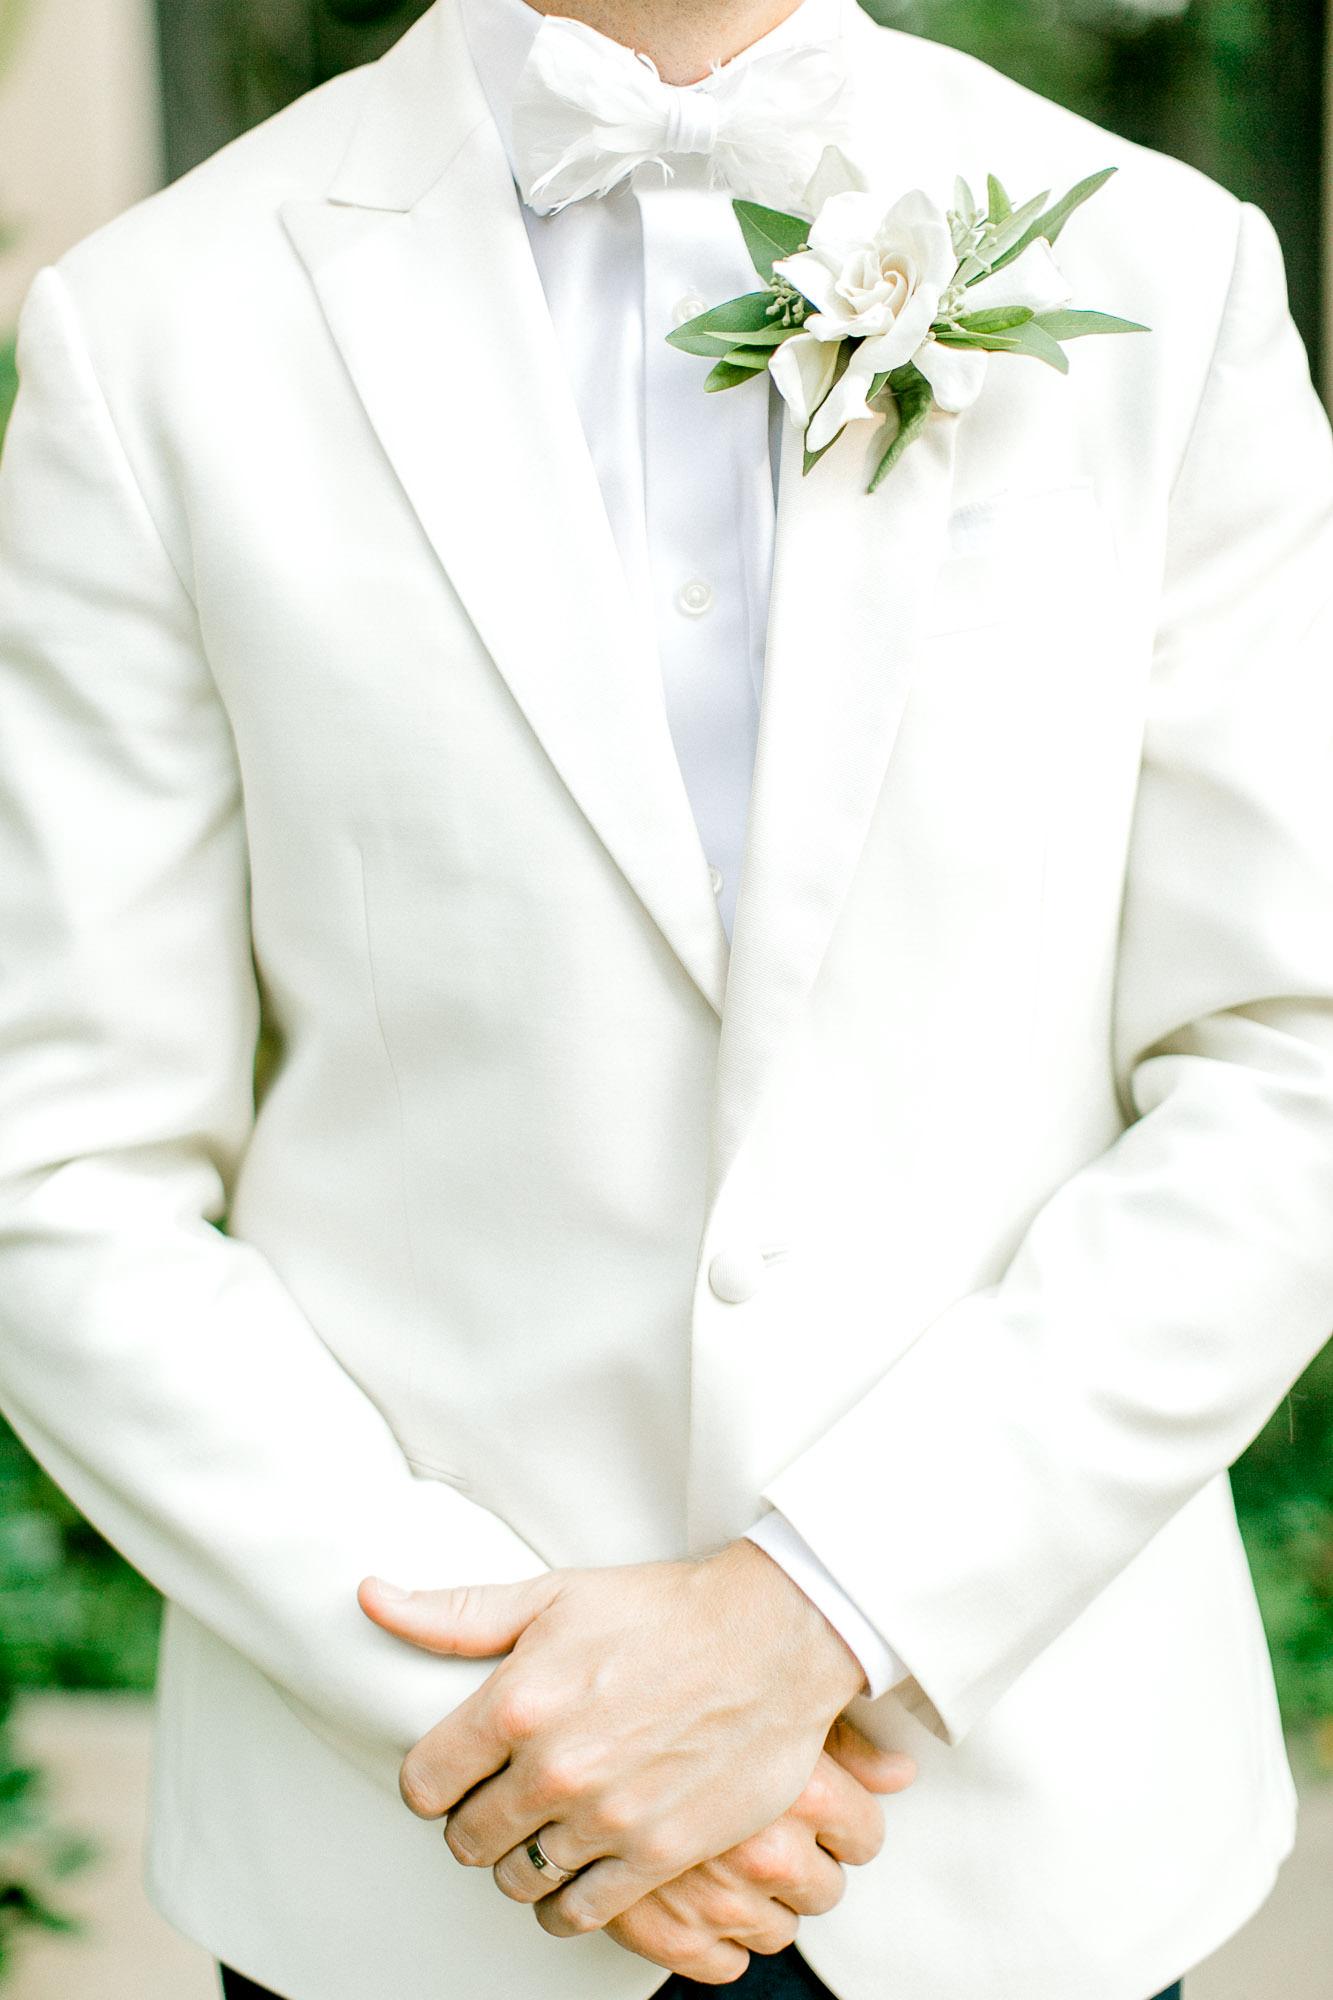 ali-brandon-hamilton-lubbock-wedding-photographer-estate-lee-lewis-construction-bee-alleej_0102.jpg